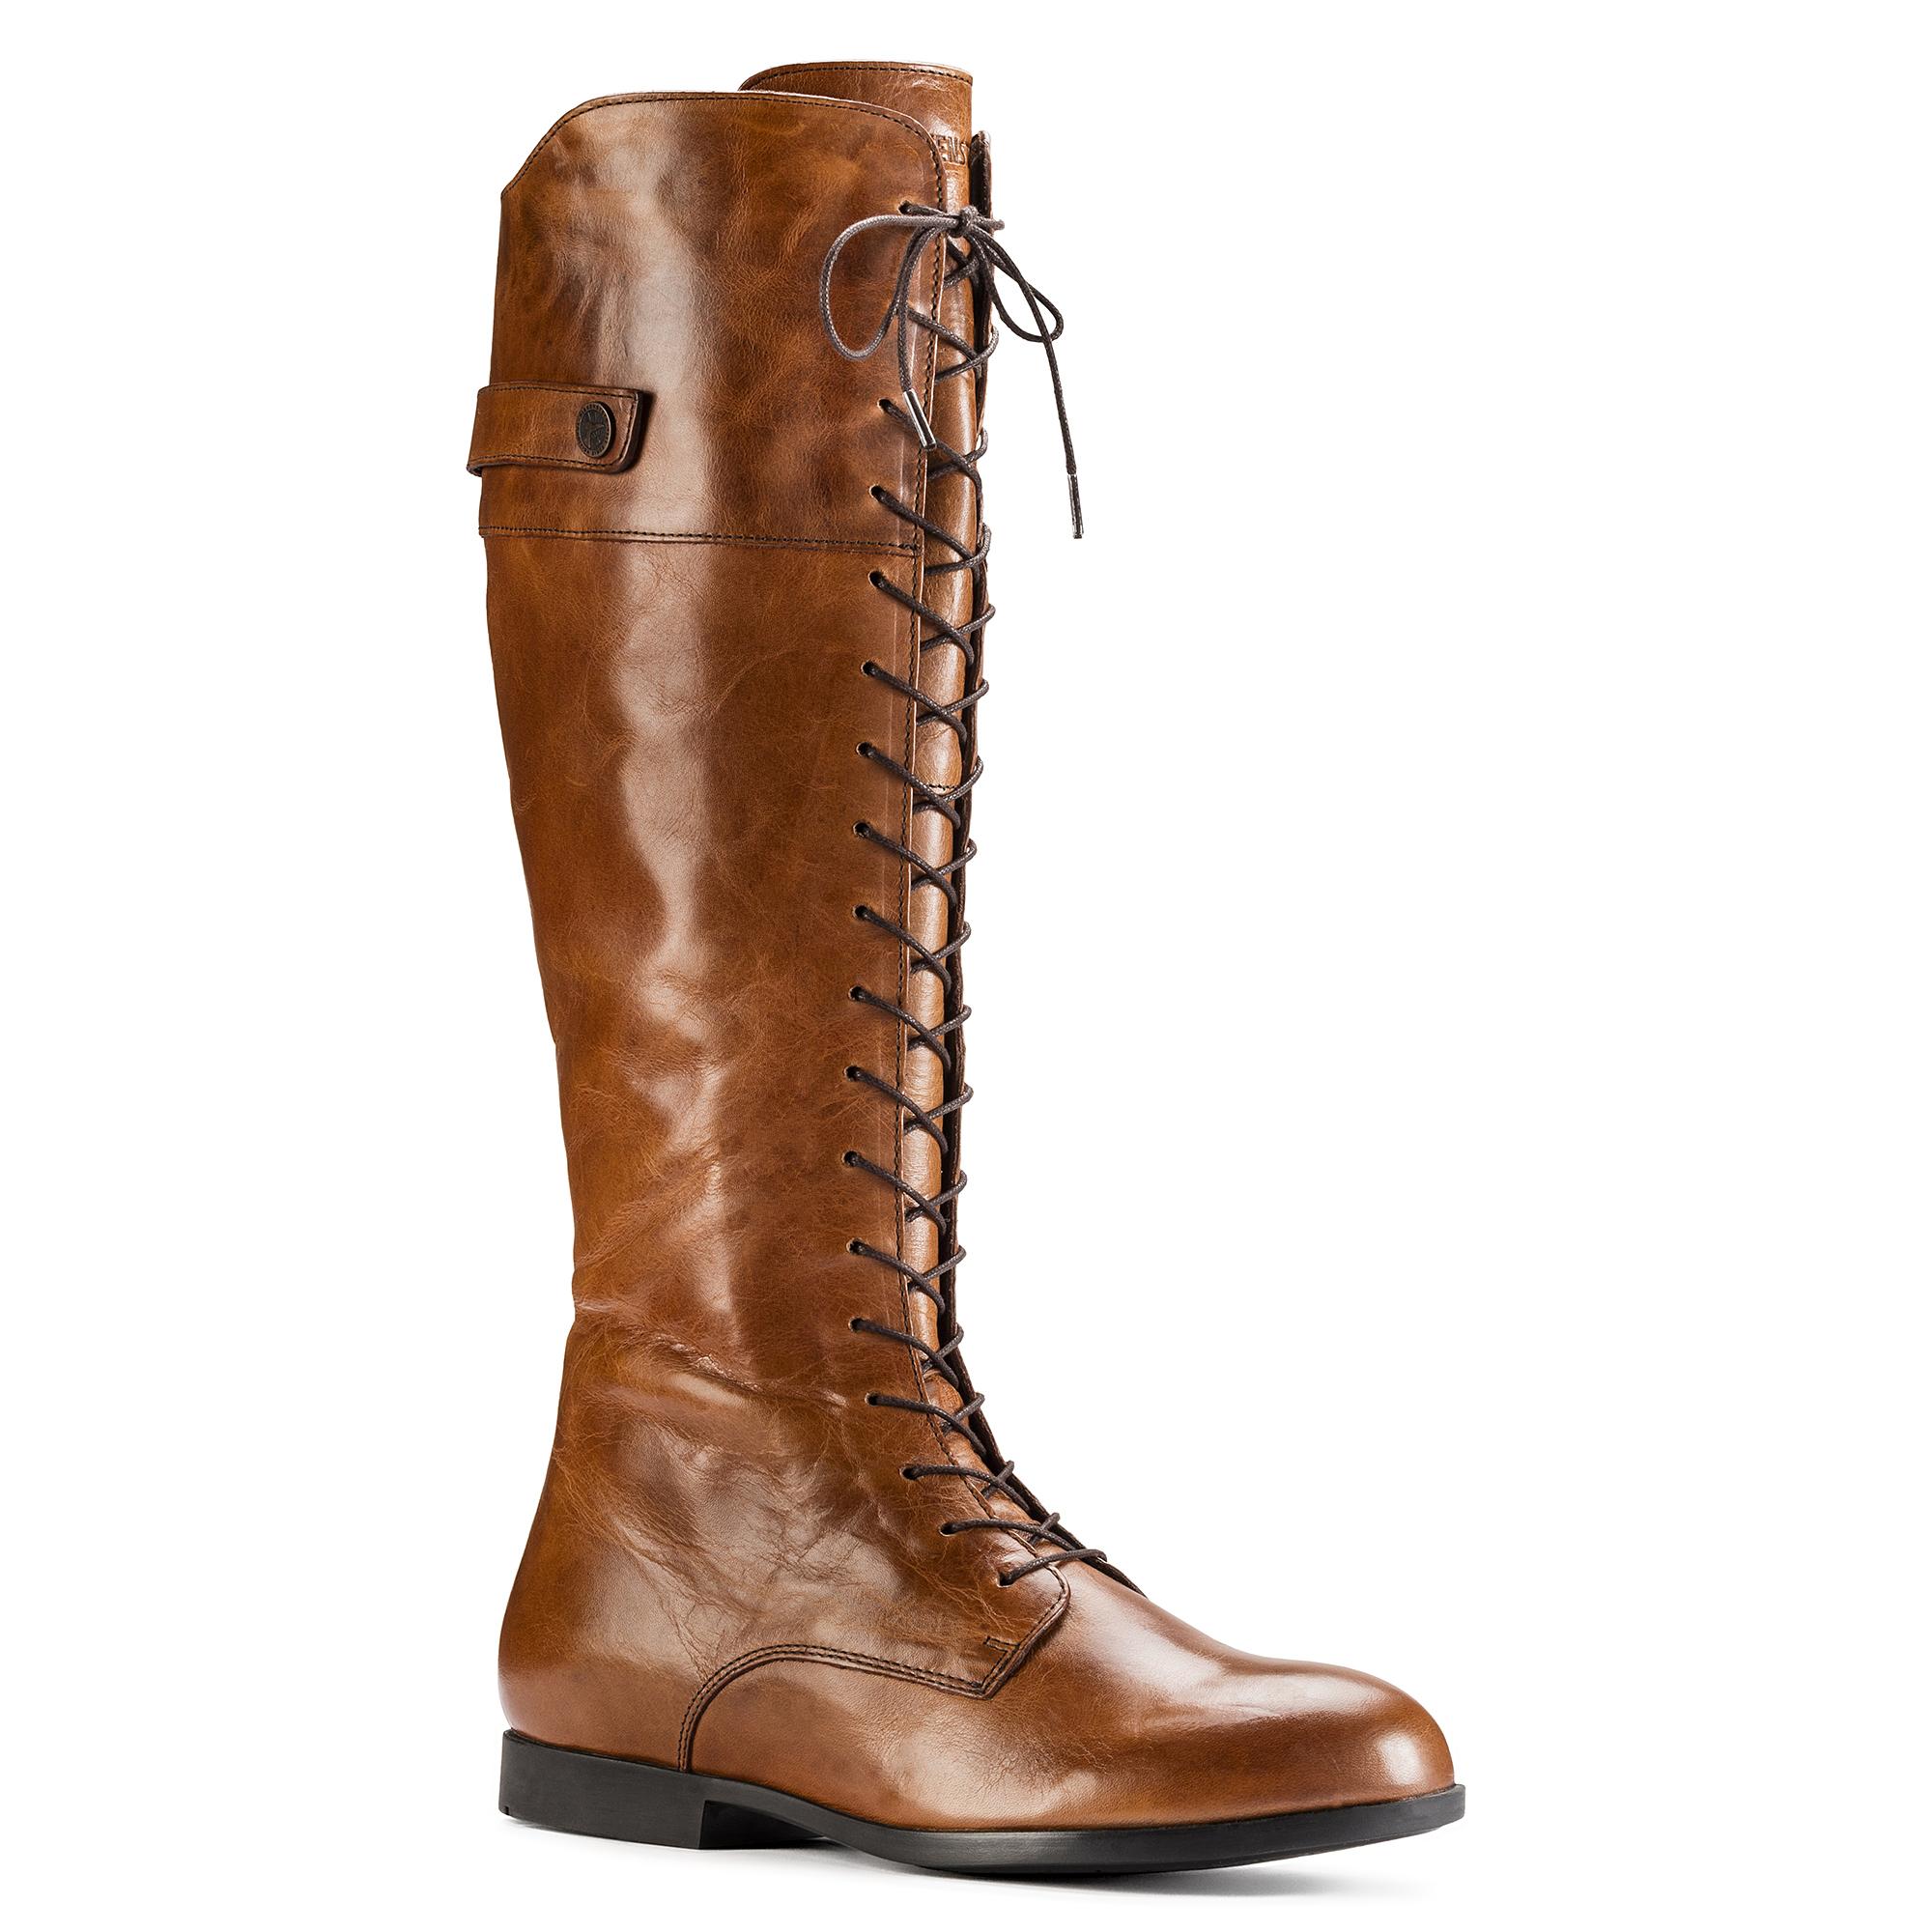 Birkenstock Women's Longford Camel Leather Boots EU 36 US 5 5.5 Regular Fit | eBay